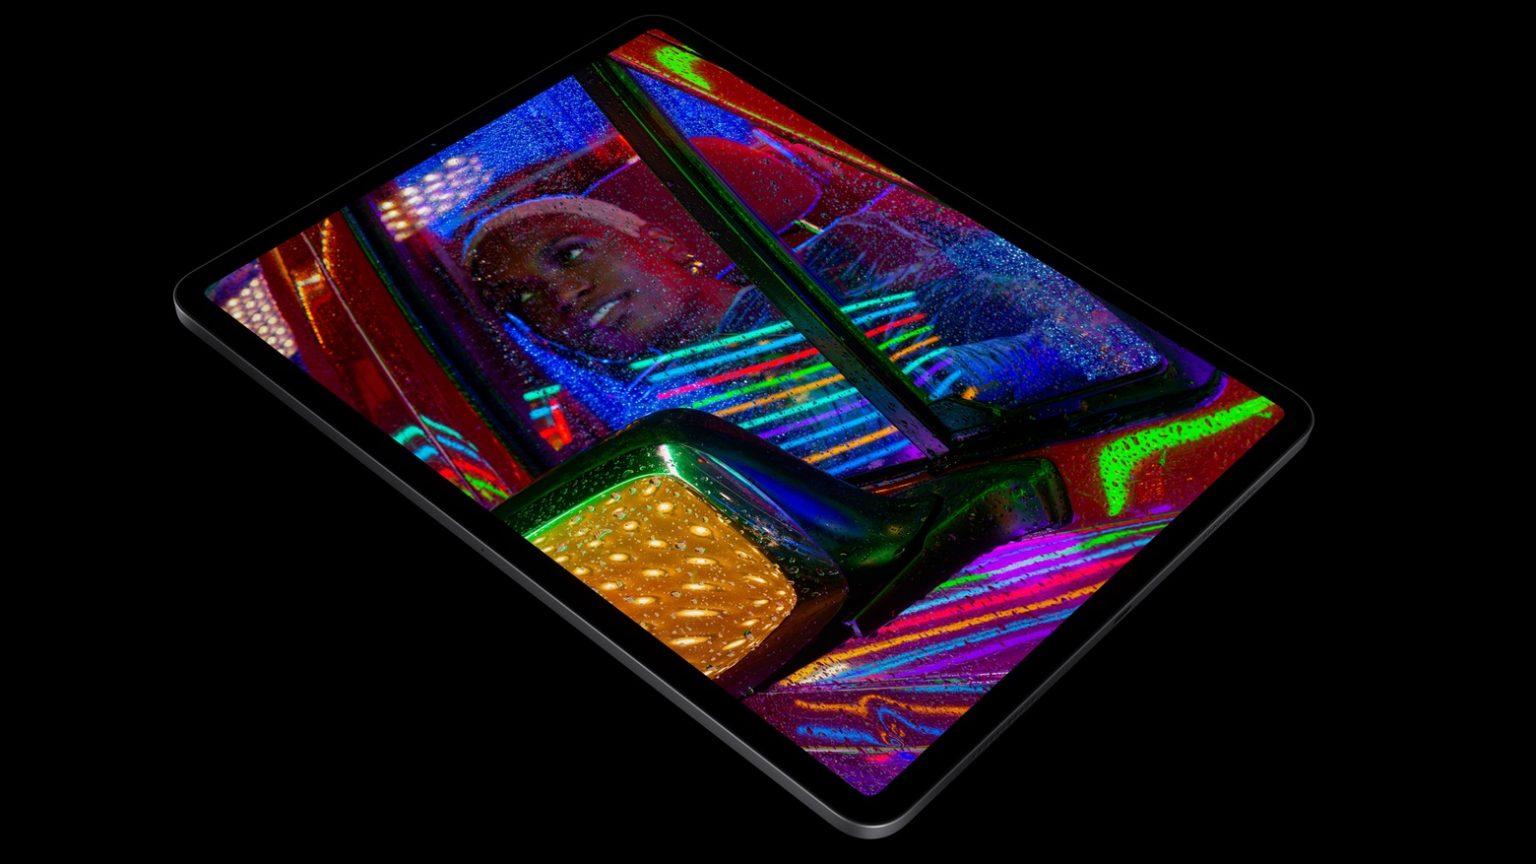 2021 iPad Pro has an amazing mini-LED display